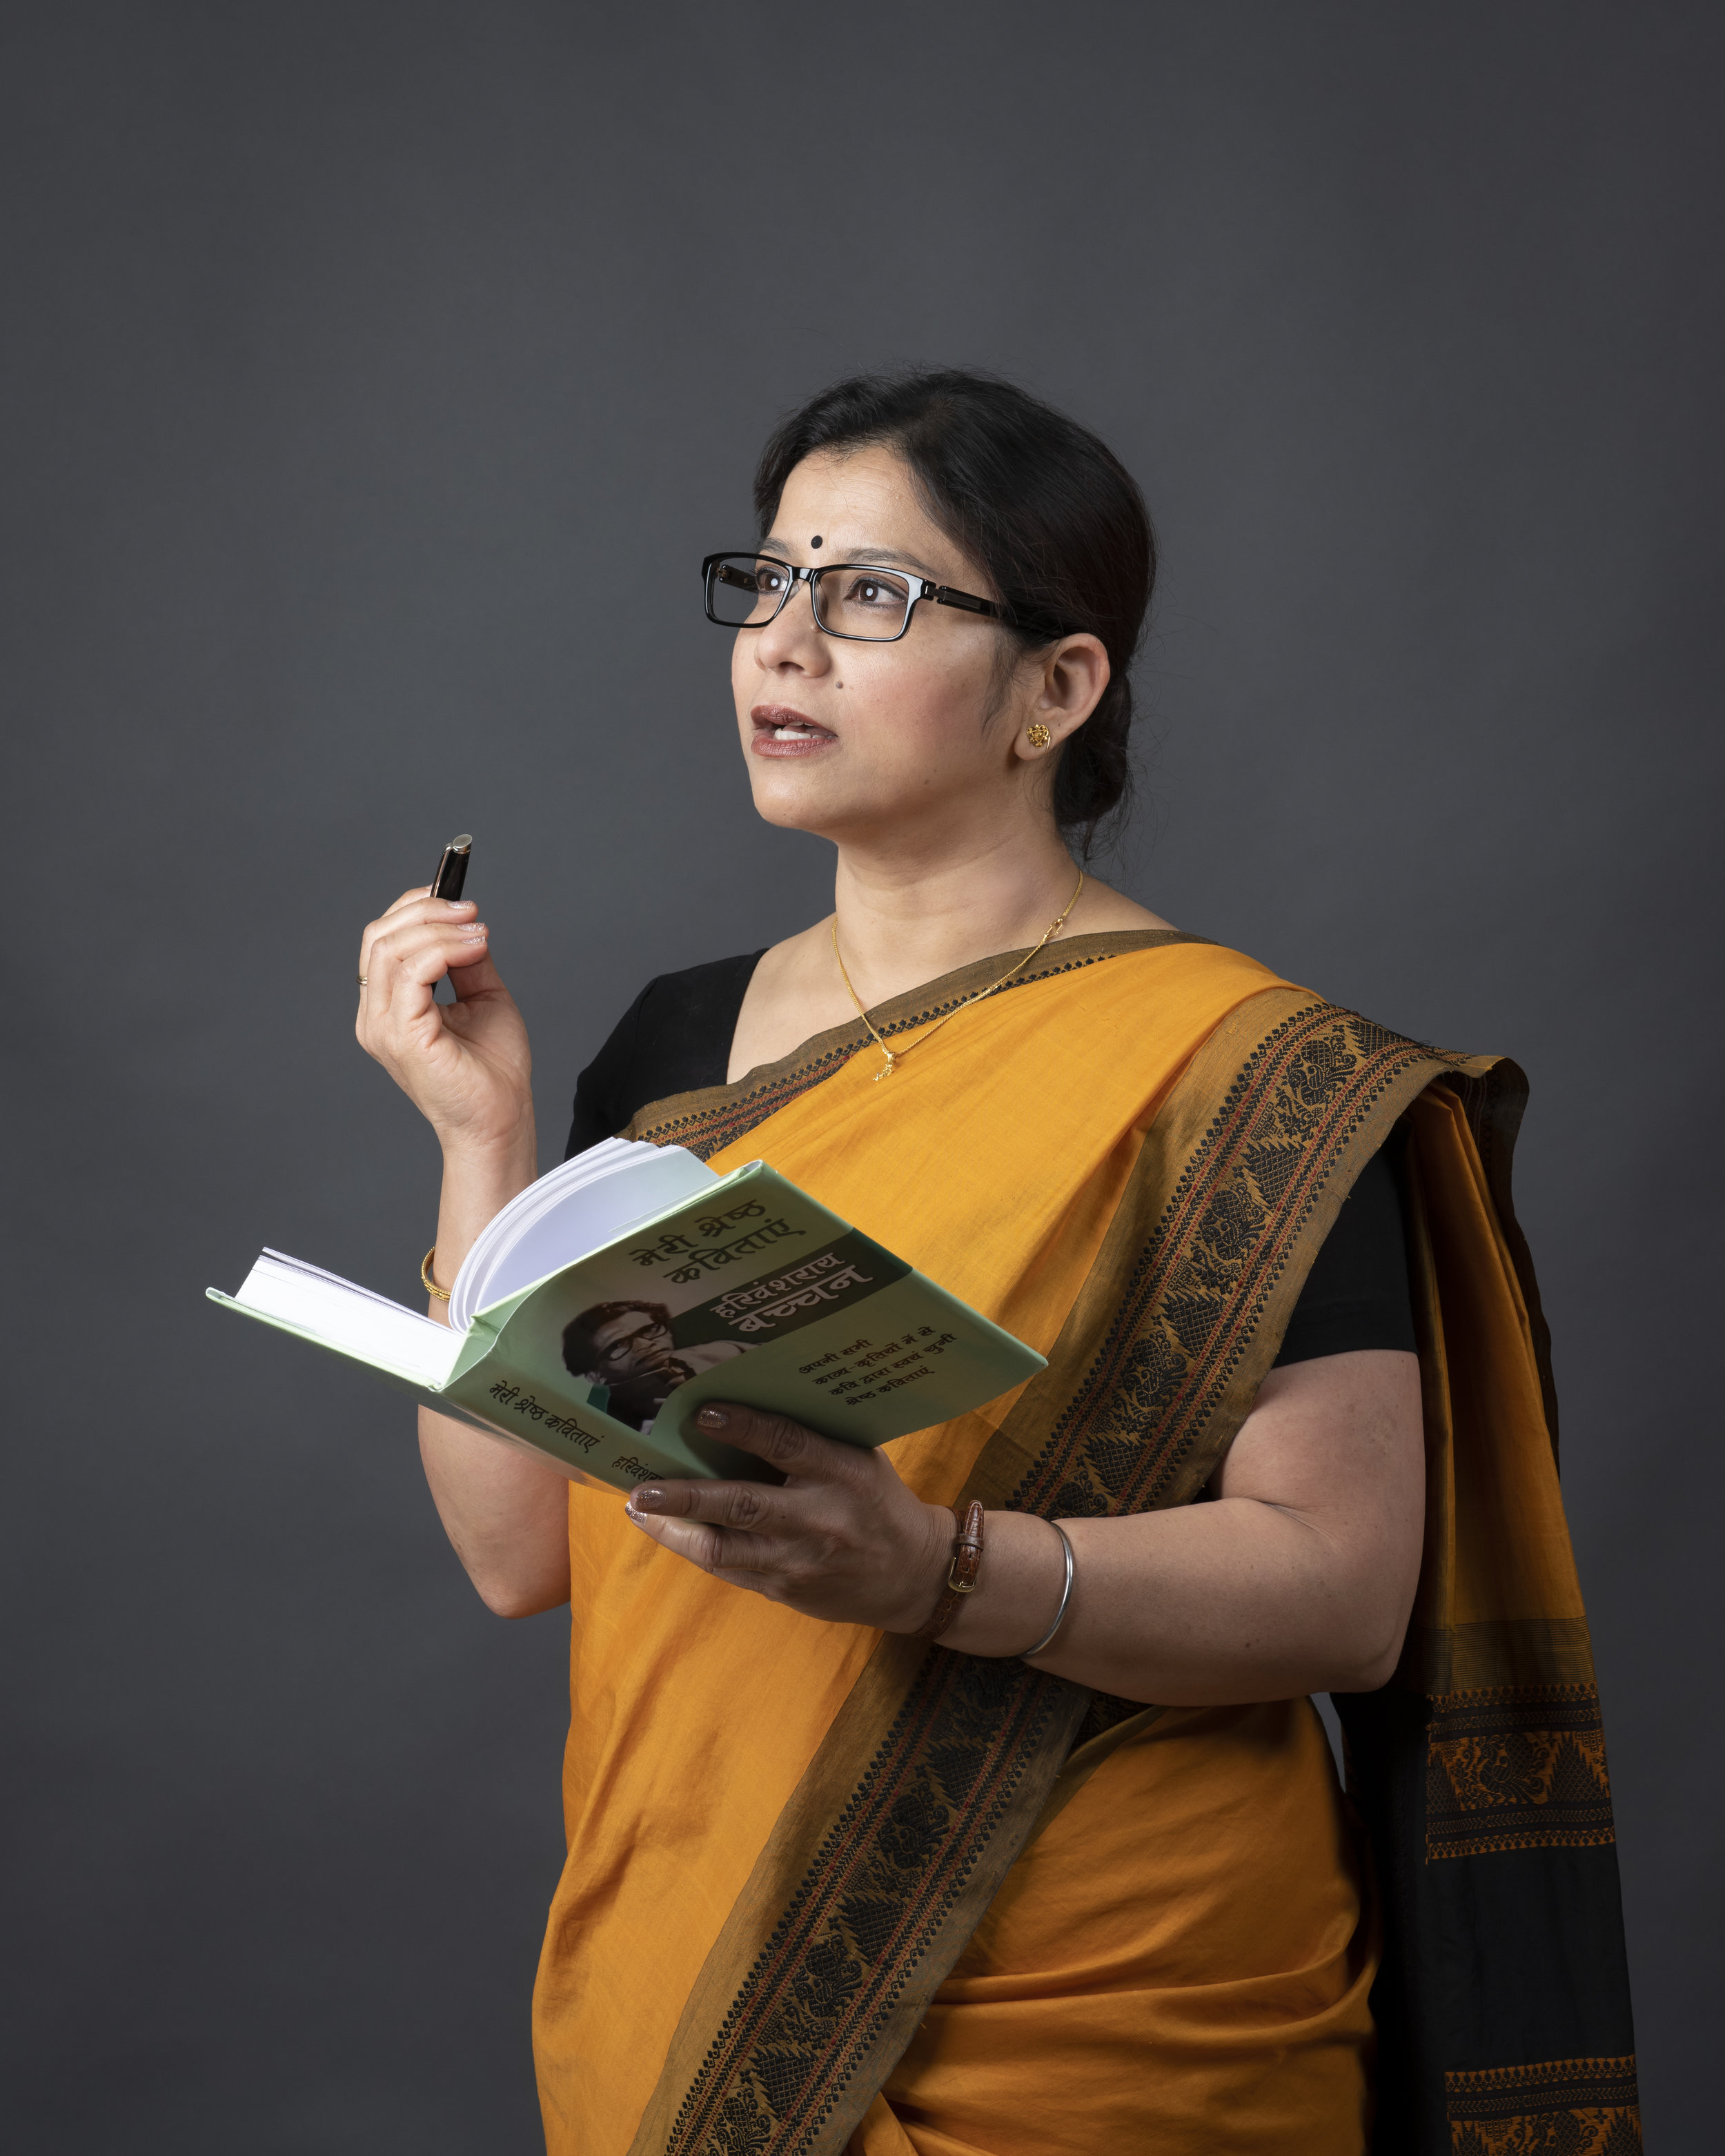 Anindita Mukherjee as ARUNA. PC: Ashima Yadava